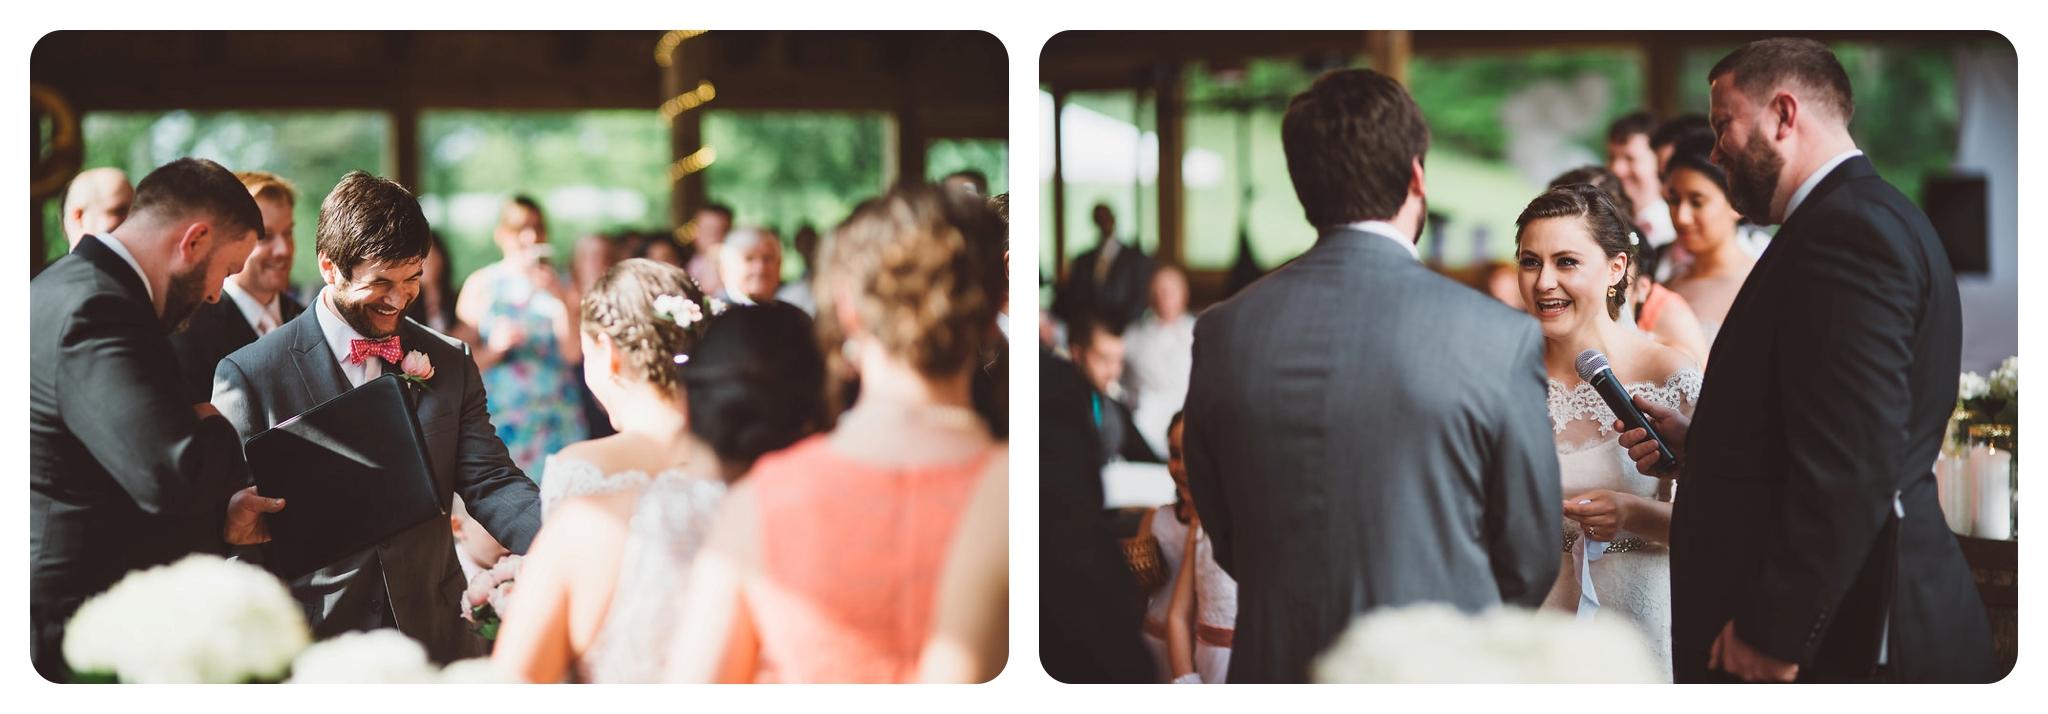 Braeloch-Weddings-Wedding-Photographer-Pat-Cori-Photography-023.jpg